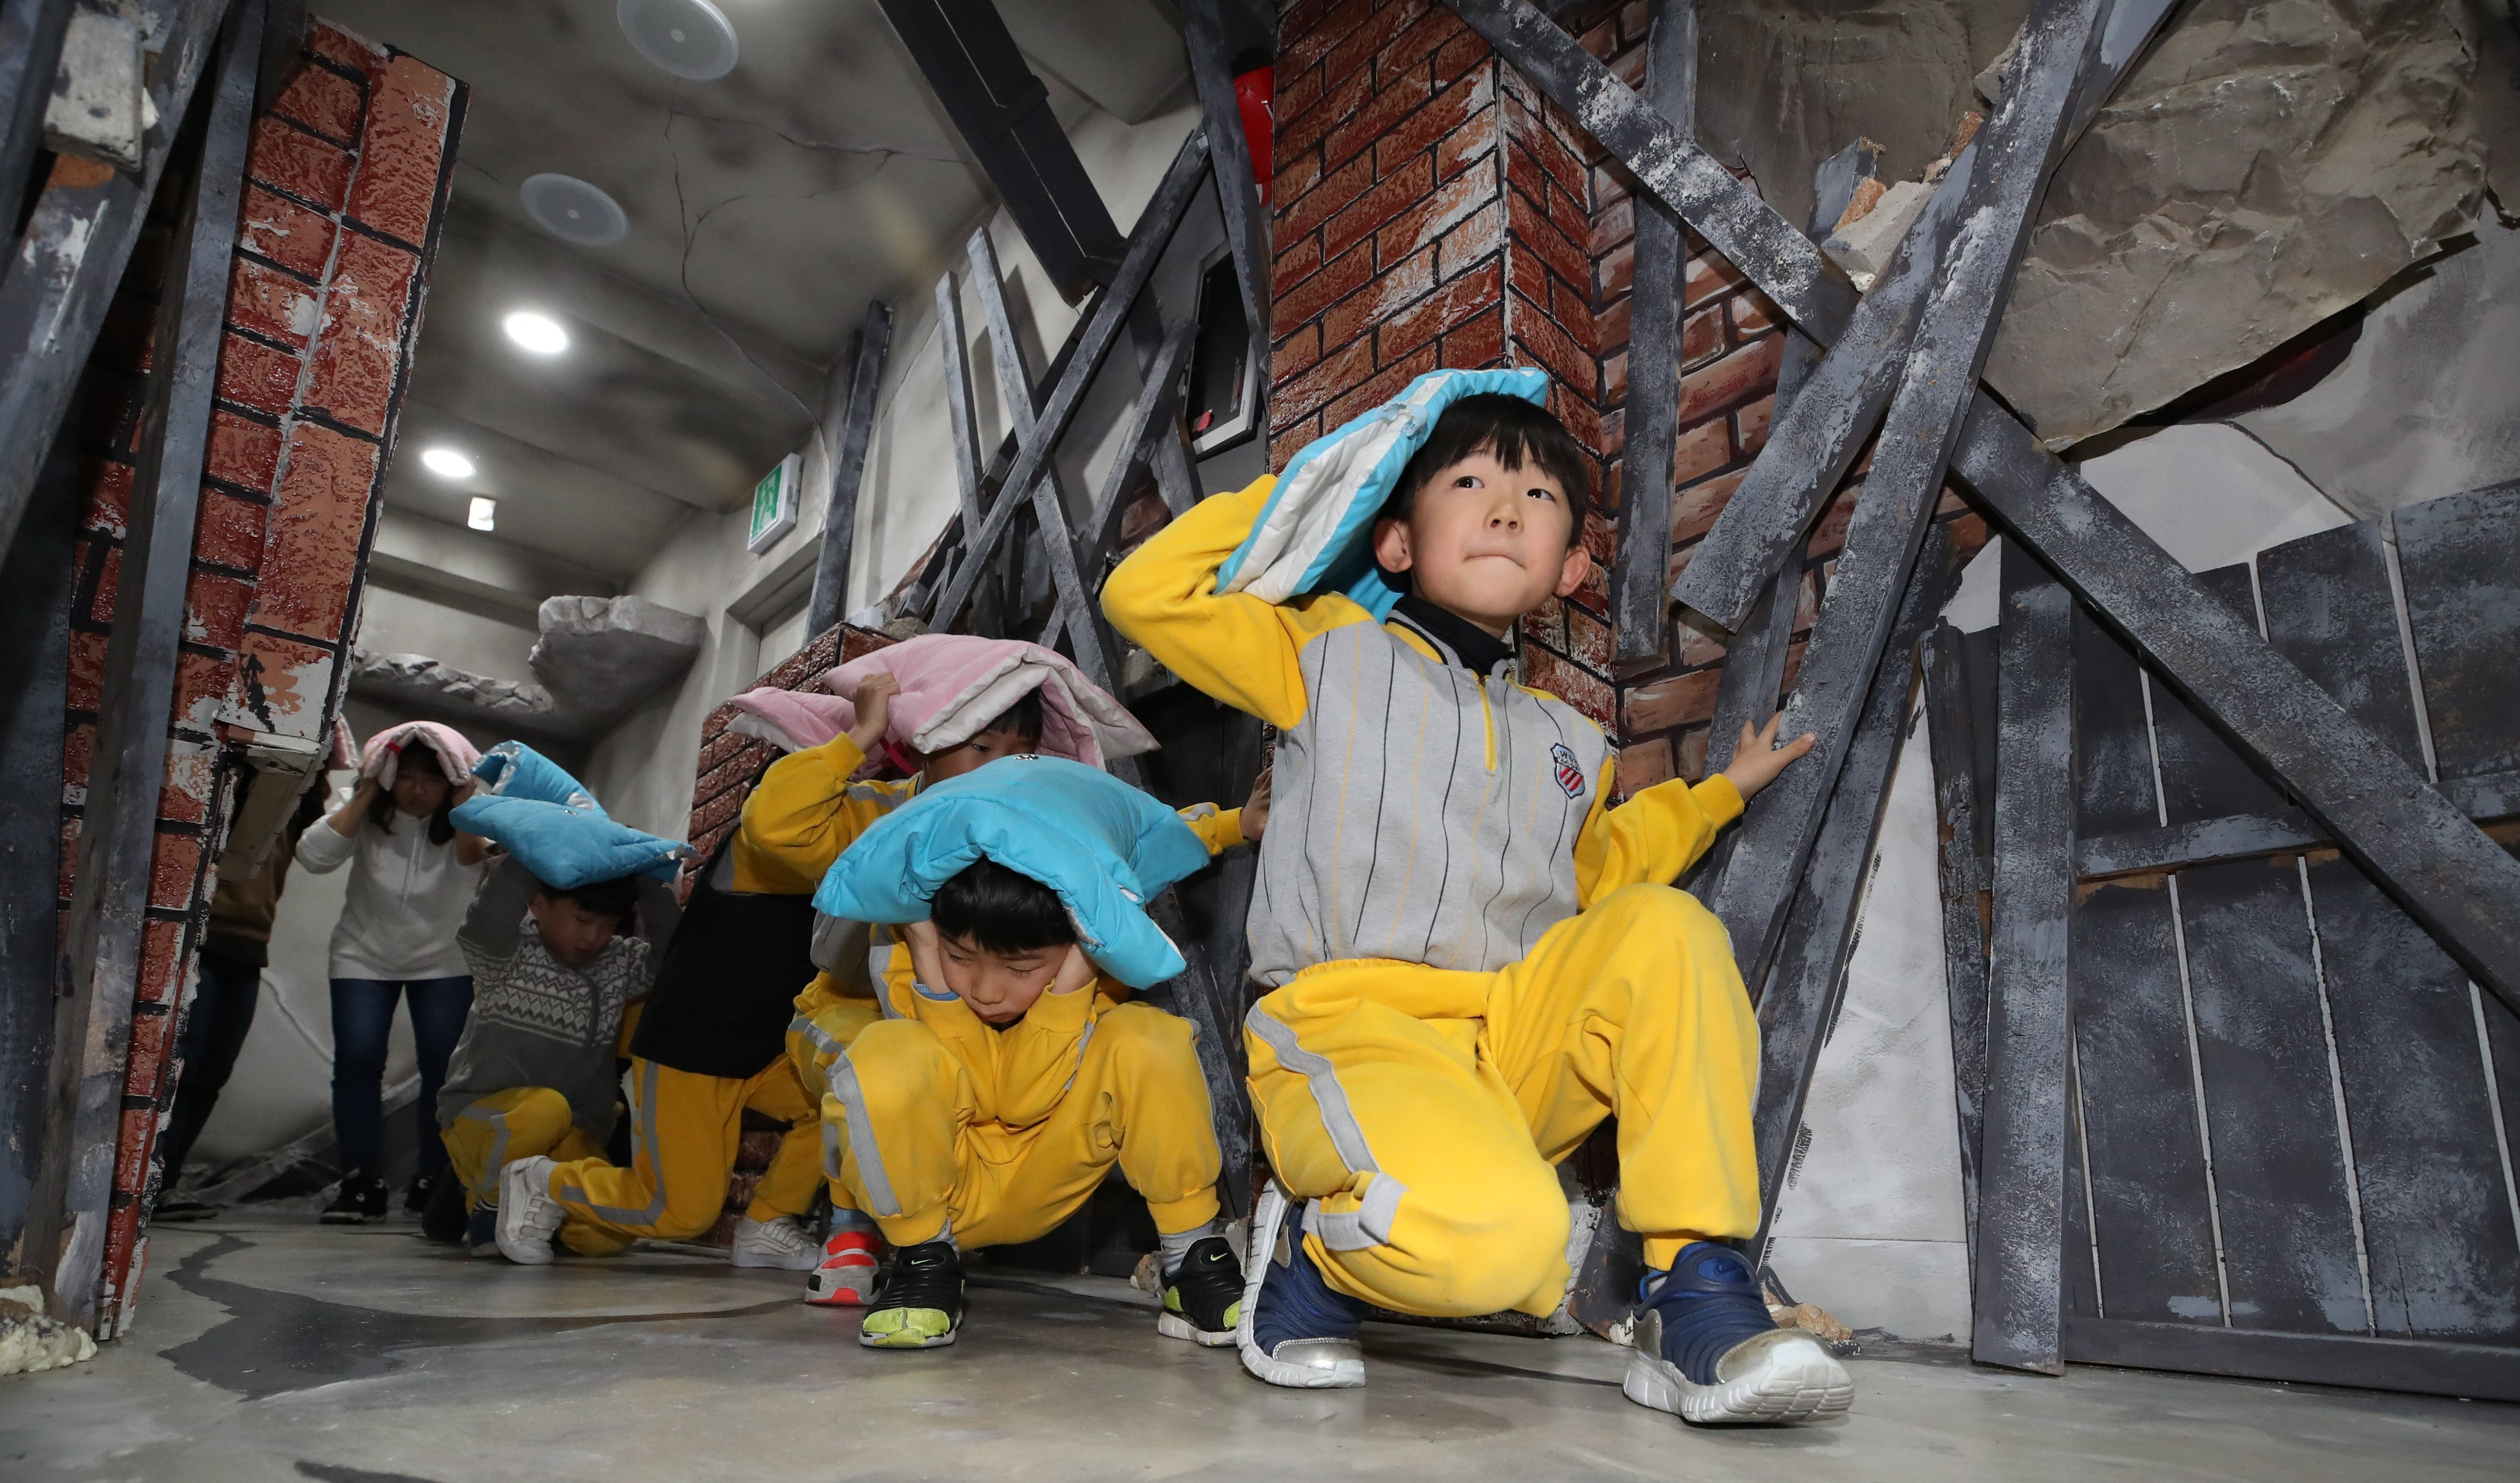 Nins sud-coreans aprenen a protegir-se en cas de terratrèmol. /YONHAP